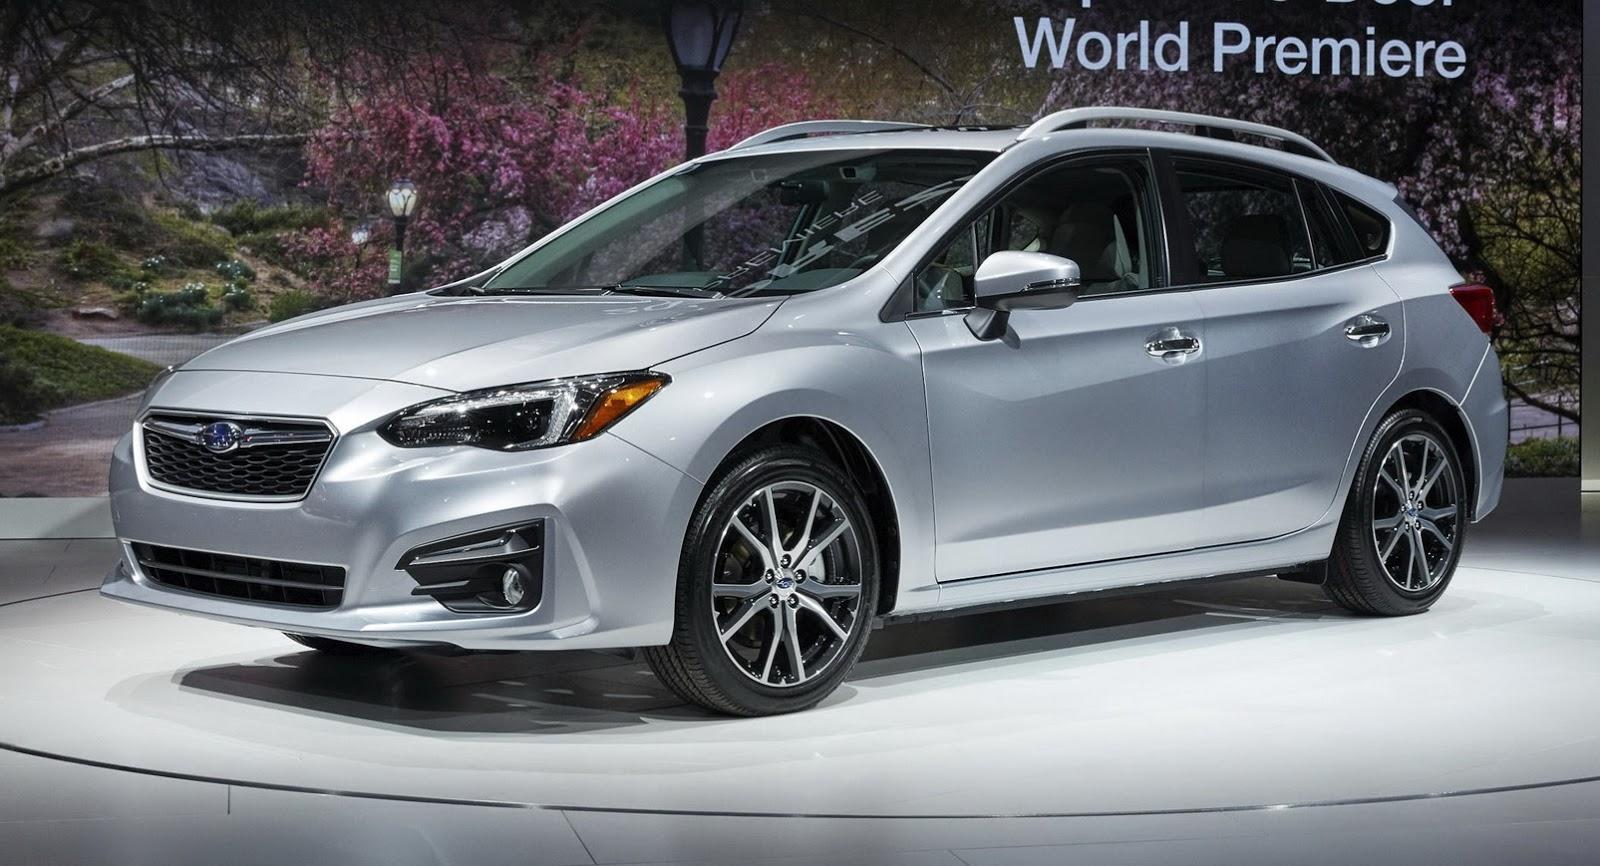 2017 Subaru Impreza Hatch Vs Concept